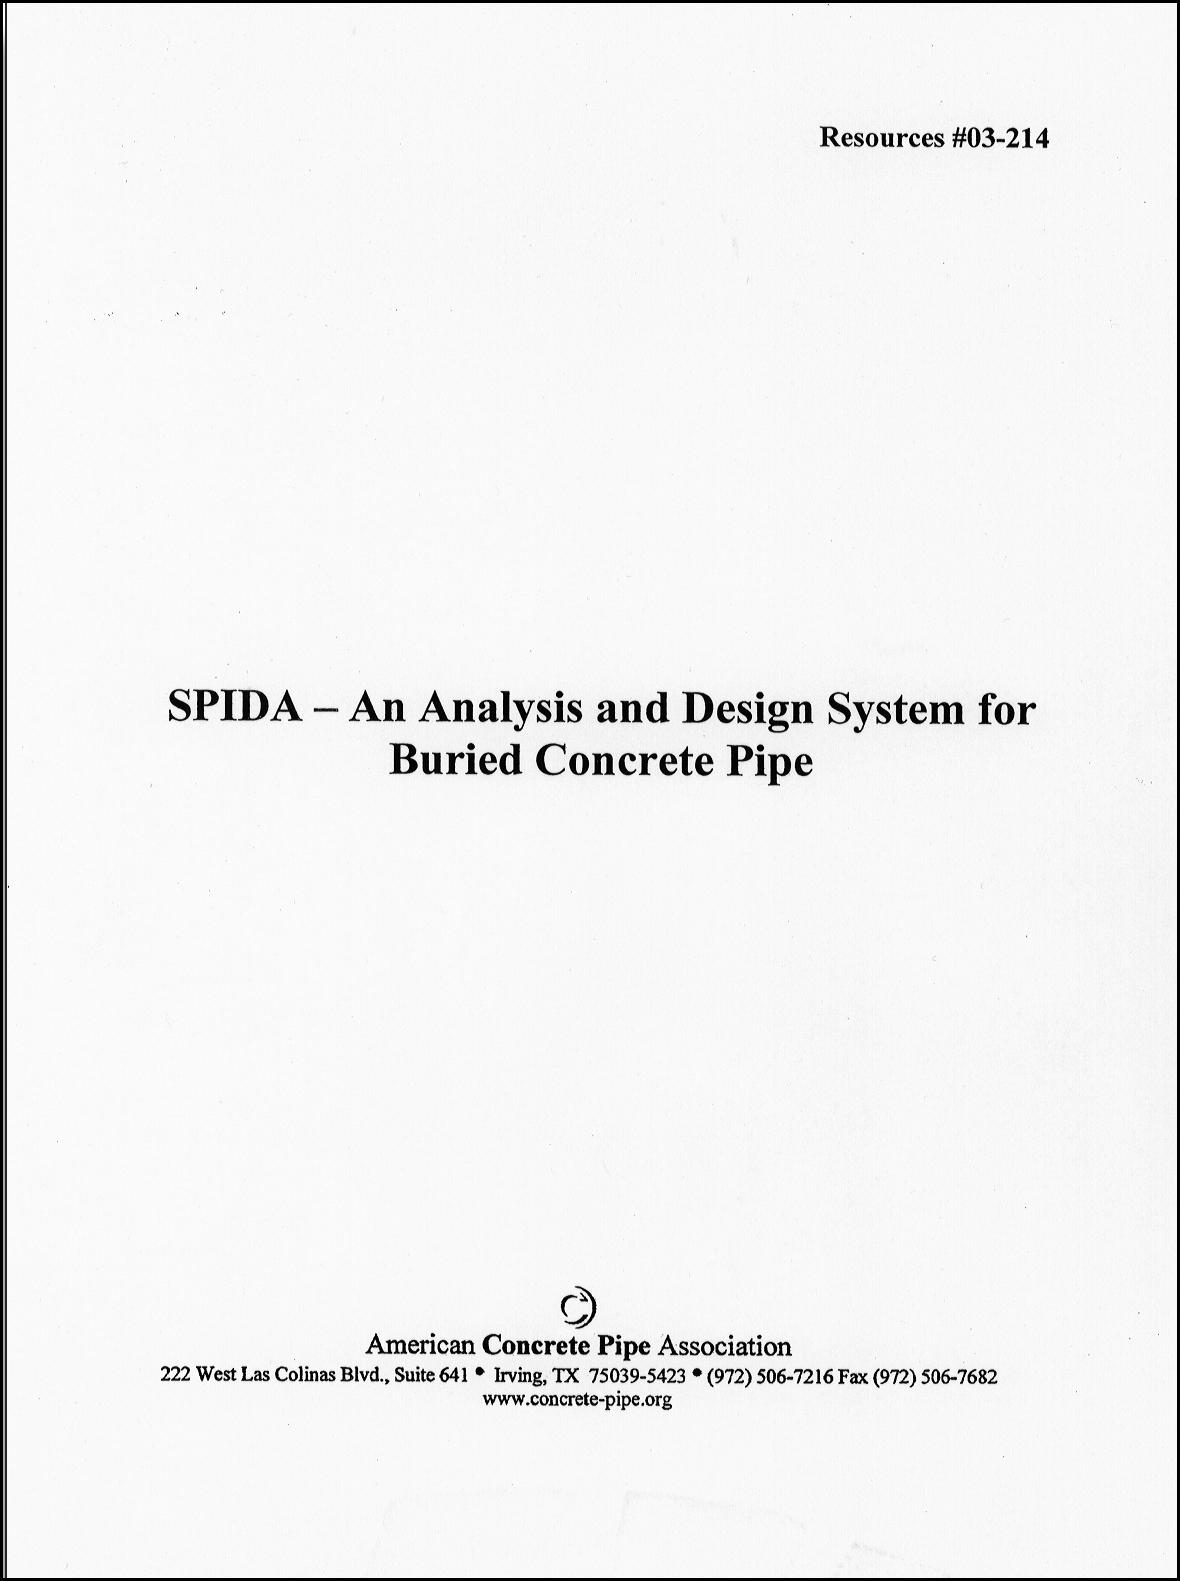 Corps of Engineer Manual-Conduits Culverts u0026 Pipes  sc 1 th 260 & Item Detail - Corps of Engineer Manual-Conduits Culverts u0026 Pipes